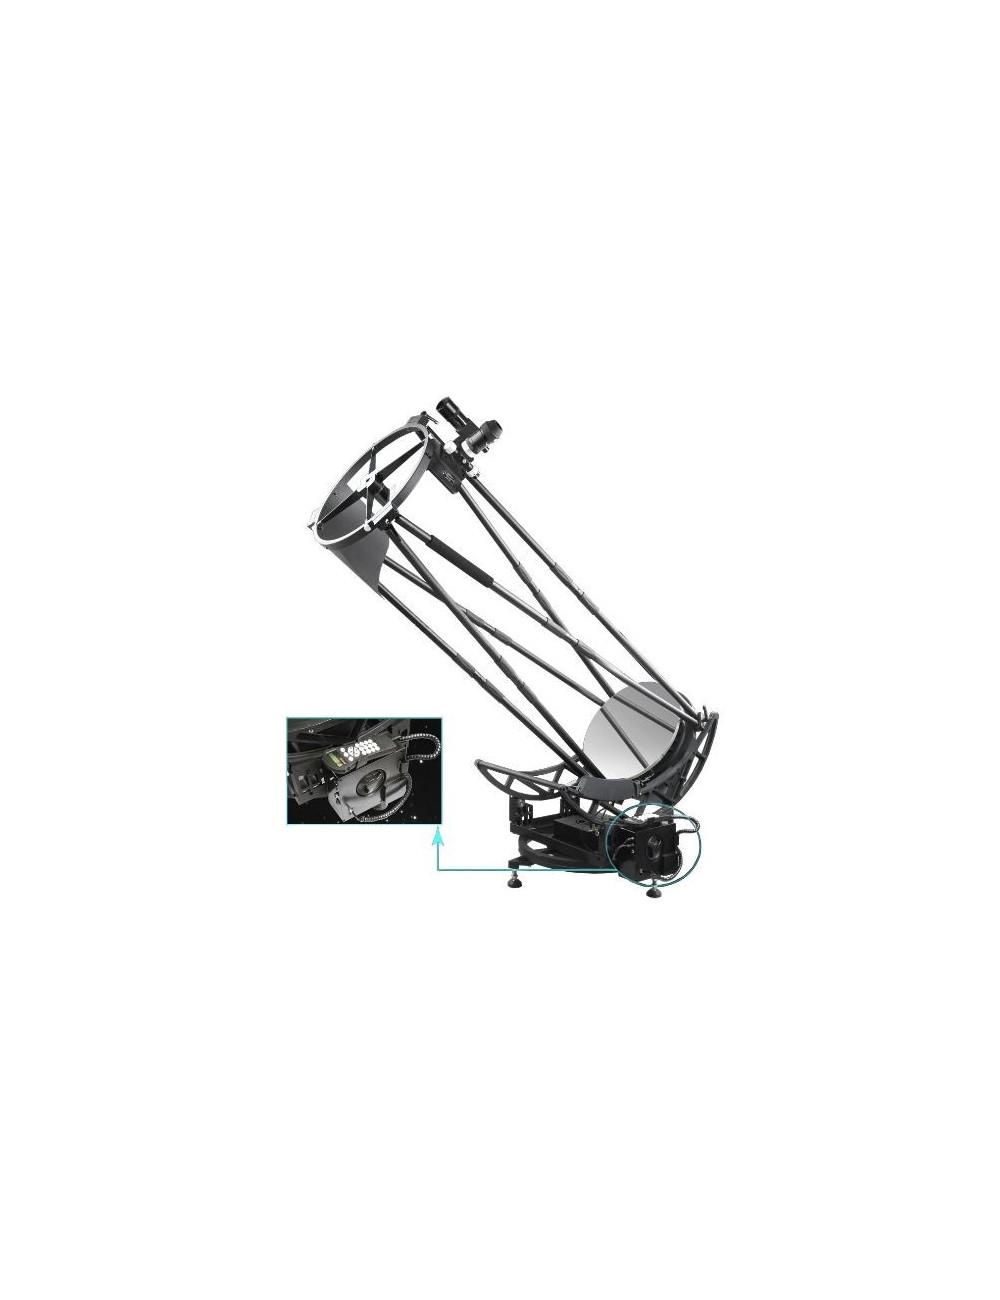 Télescope Dobson Sky-Watcher StarGate Astrolitech 458/1900 Go-To